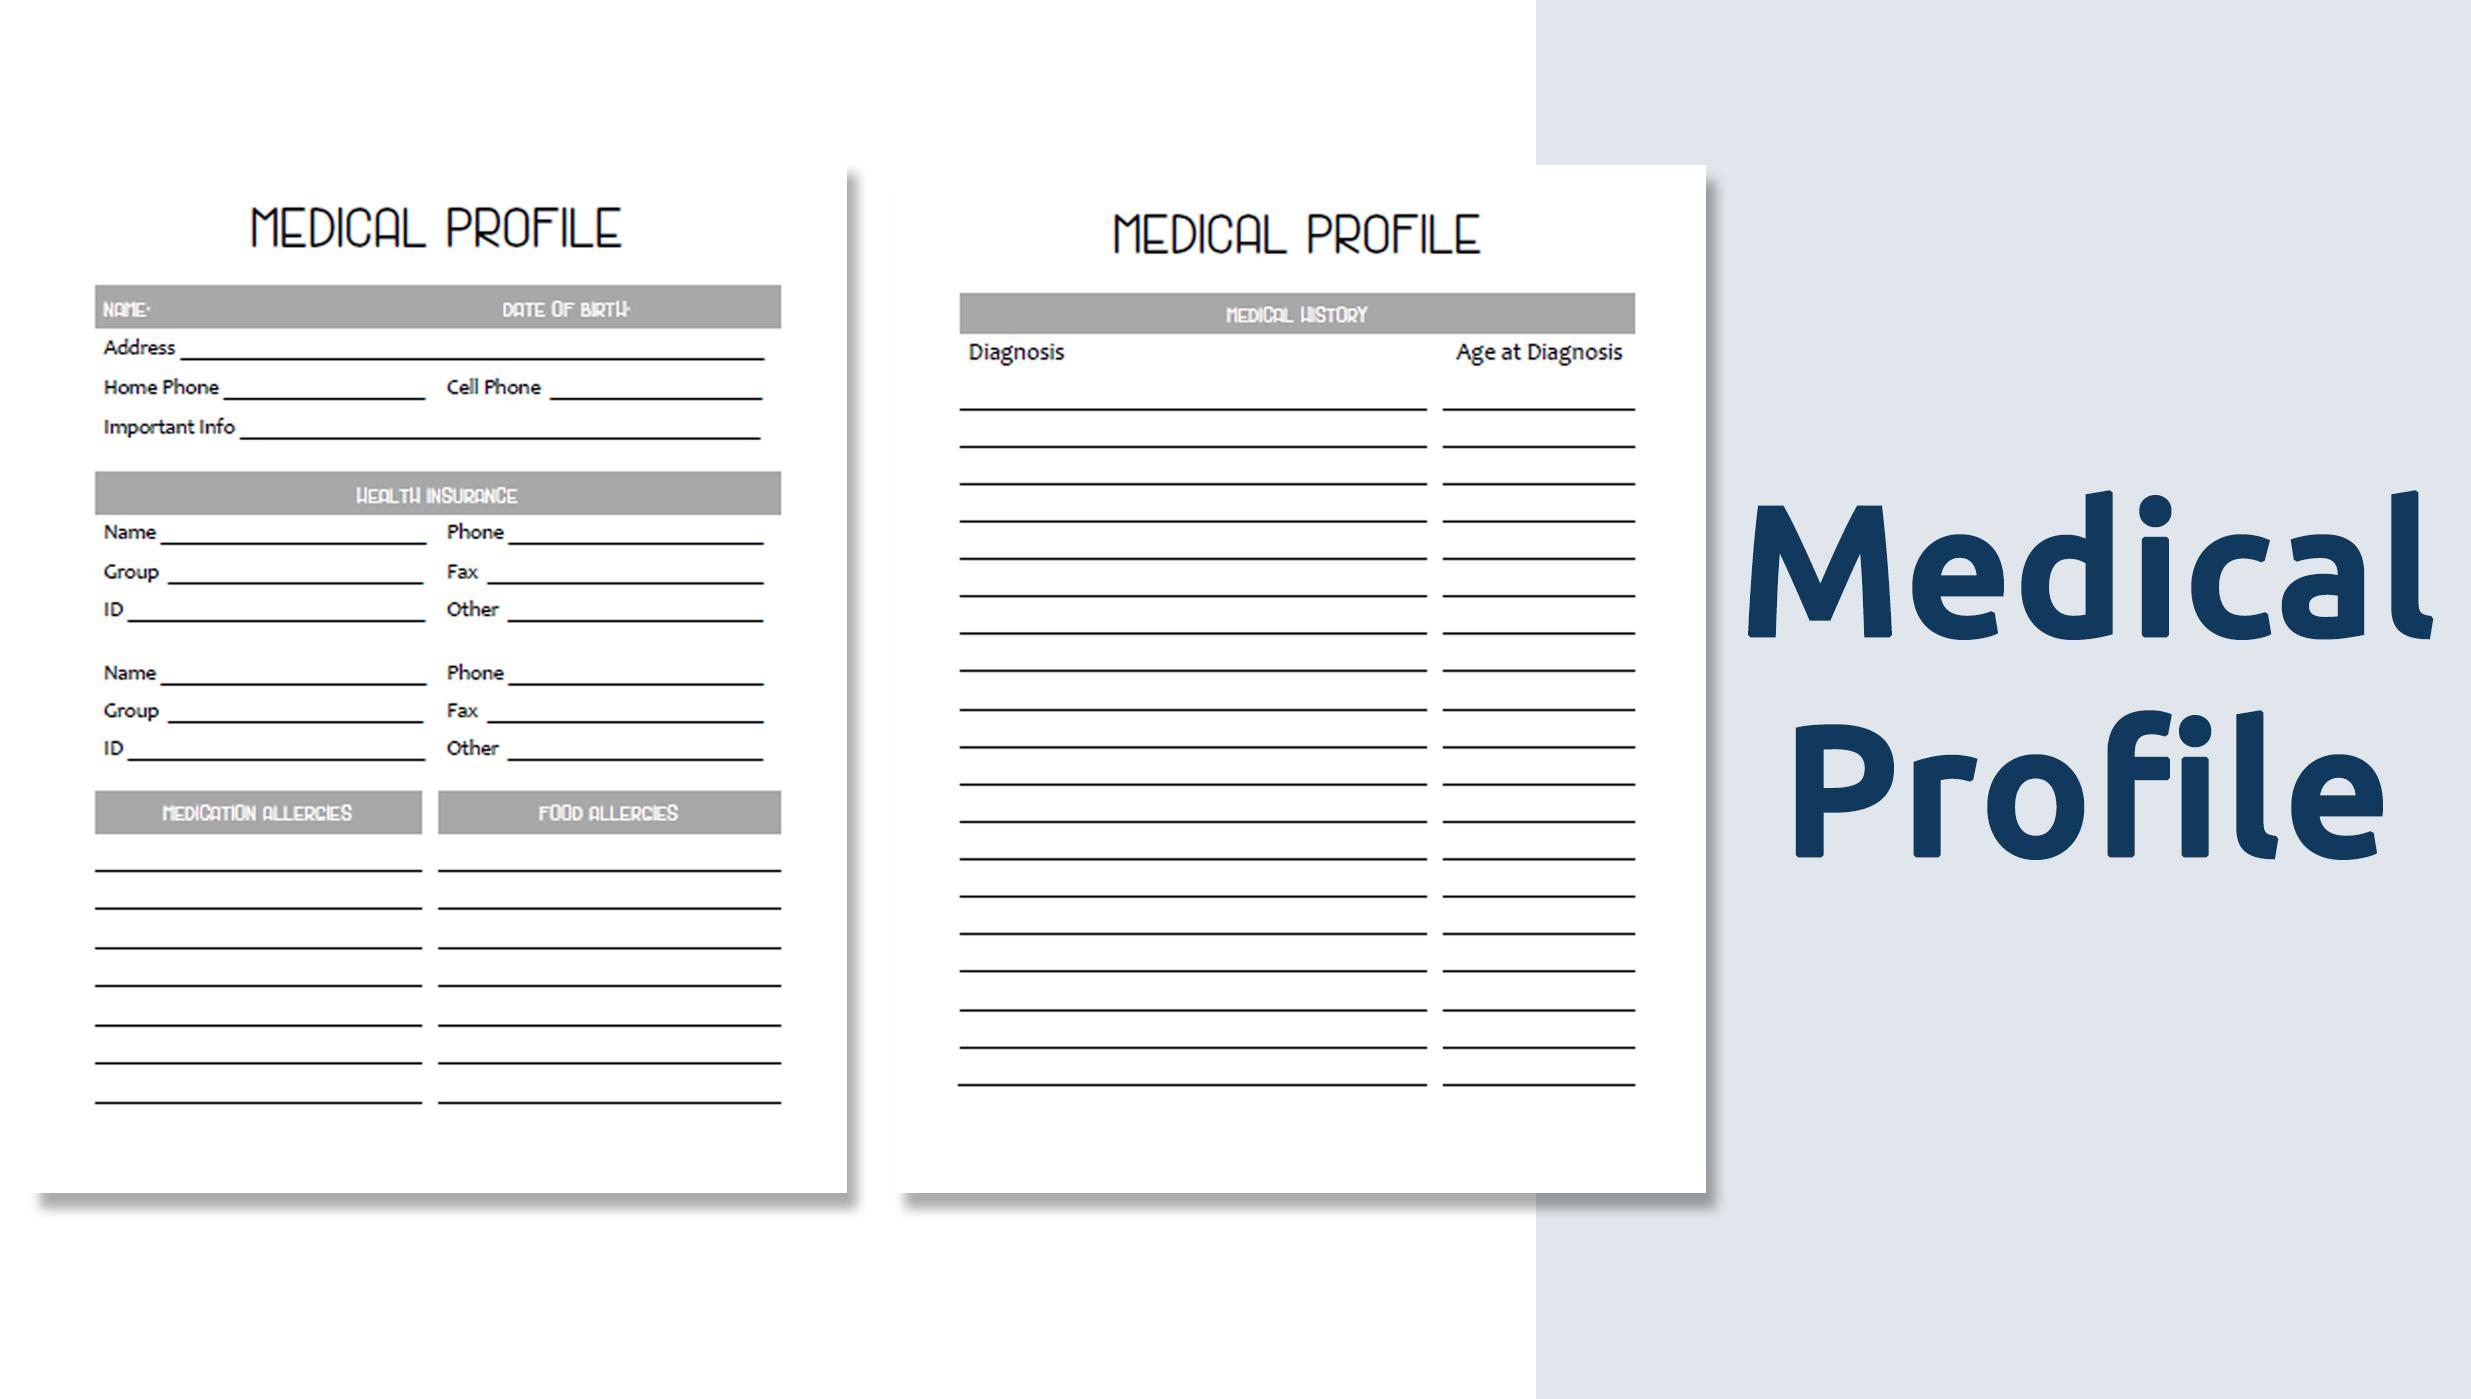 Medical Profile.jpg